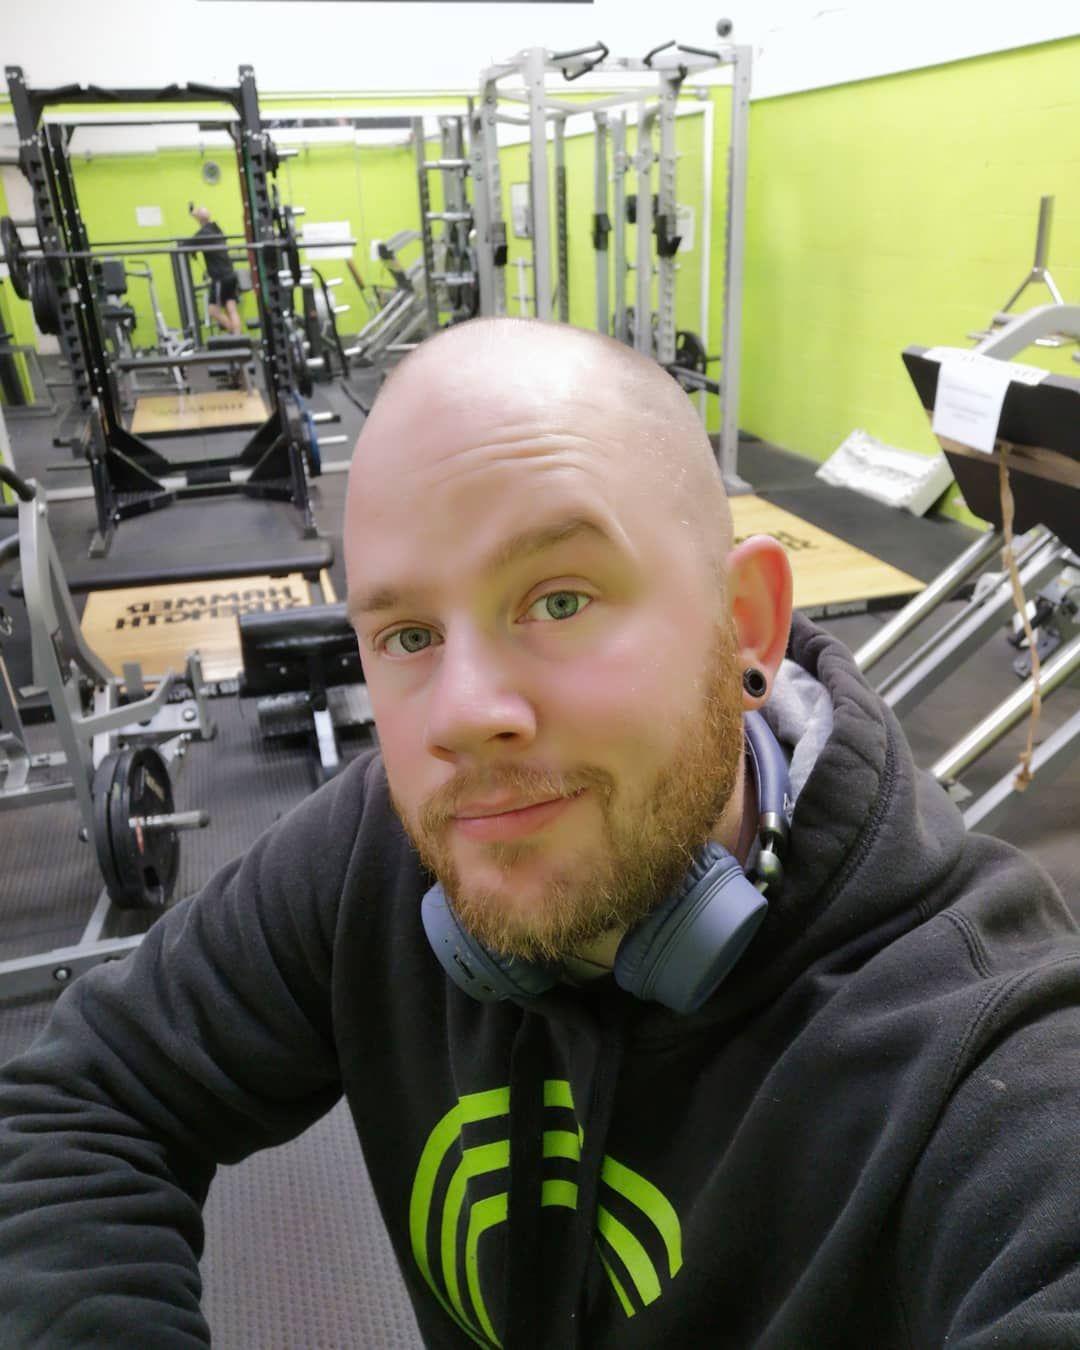 Leg day.....I'm not as happy as I look really 🥴🥴🥴😂 #myfitnessjourney #macros #fitness #healthy #heal...